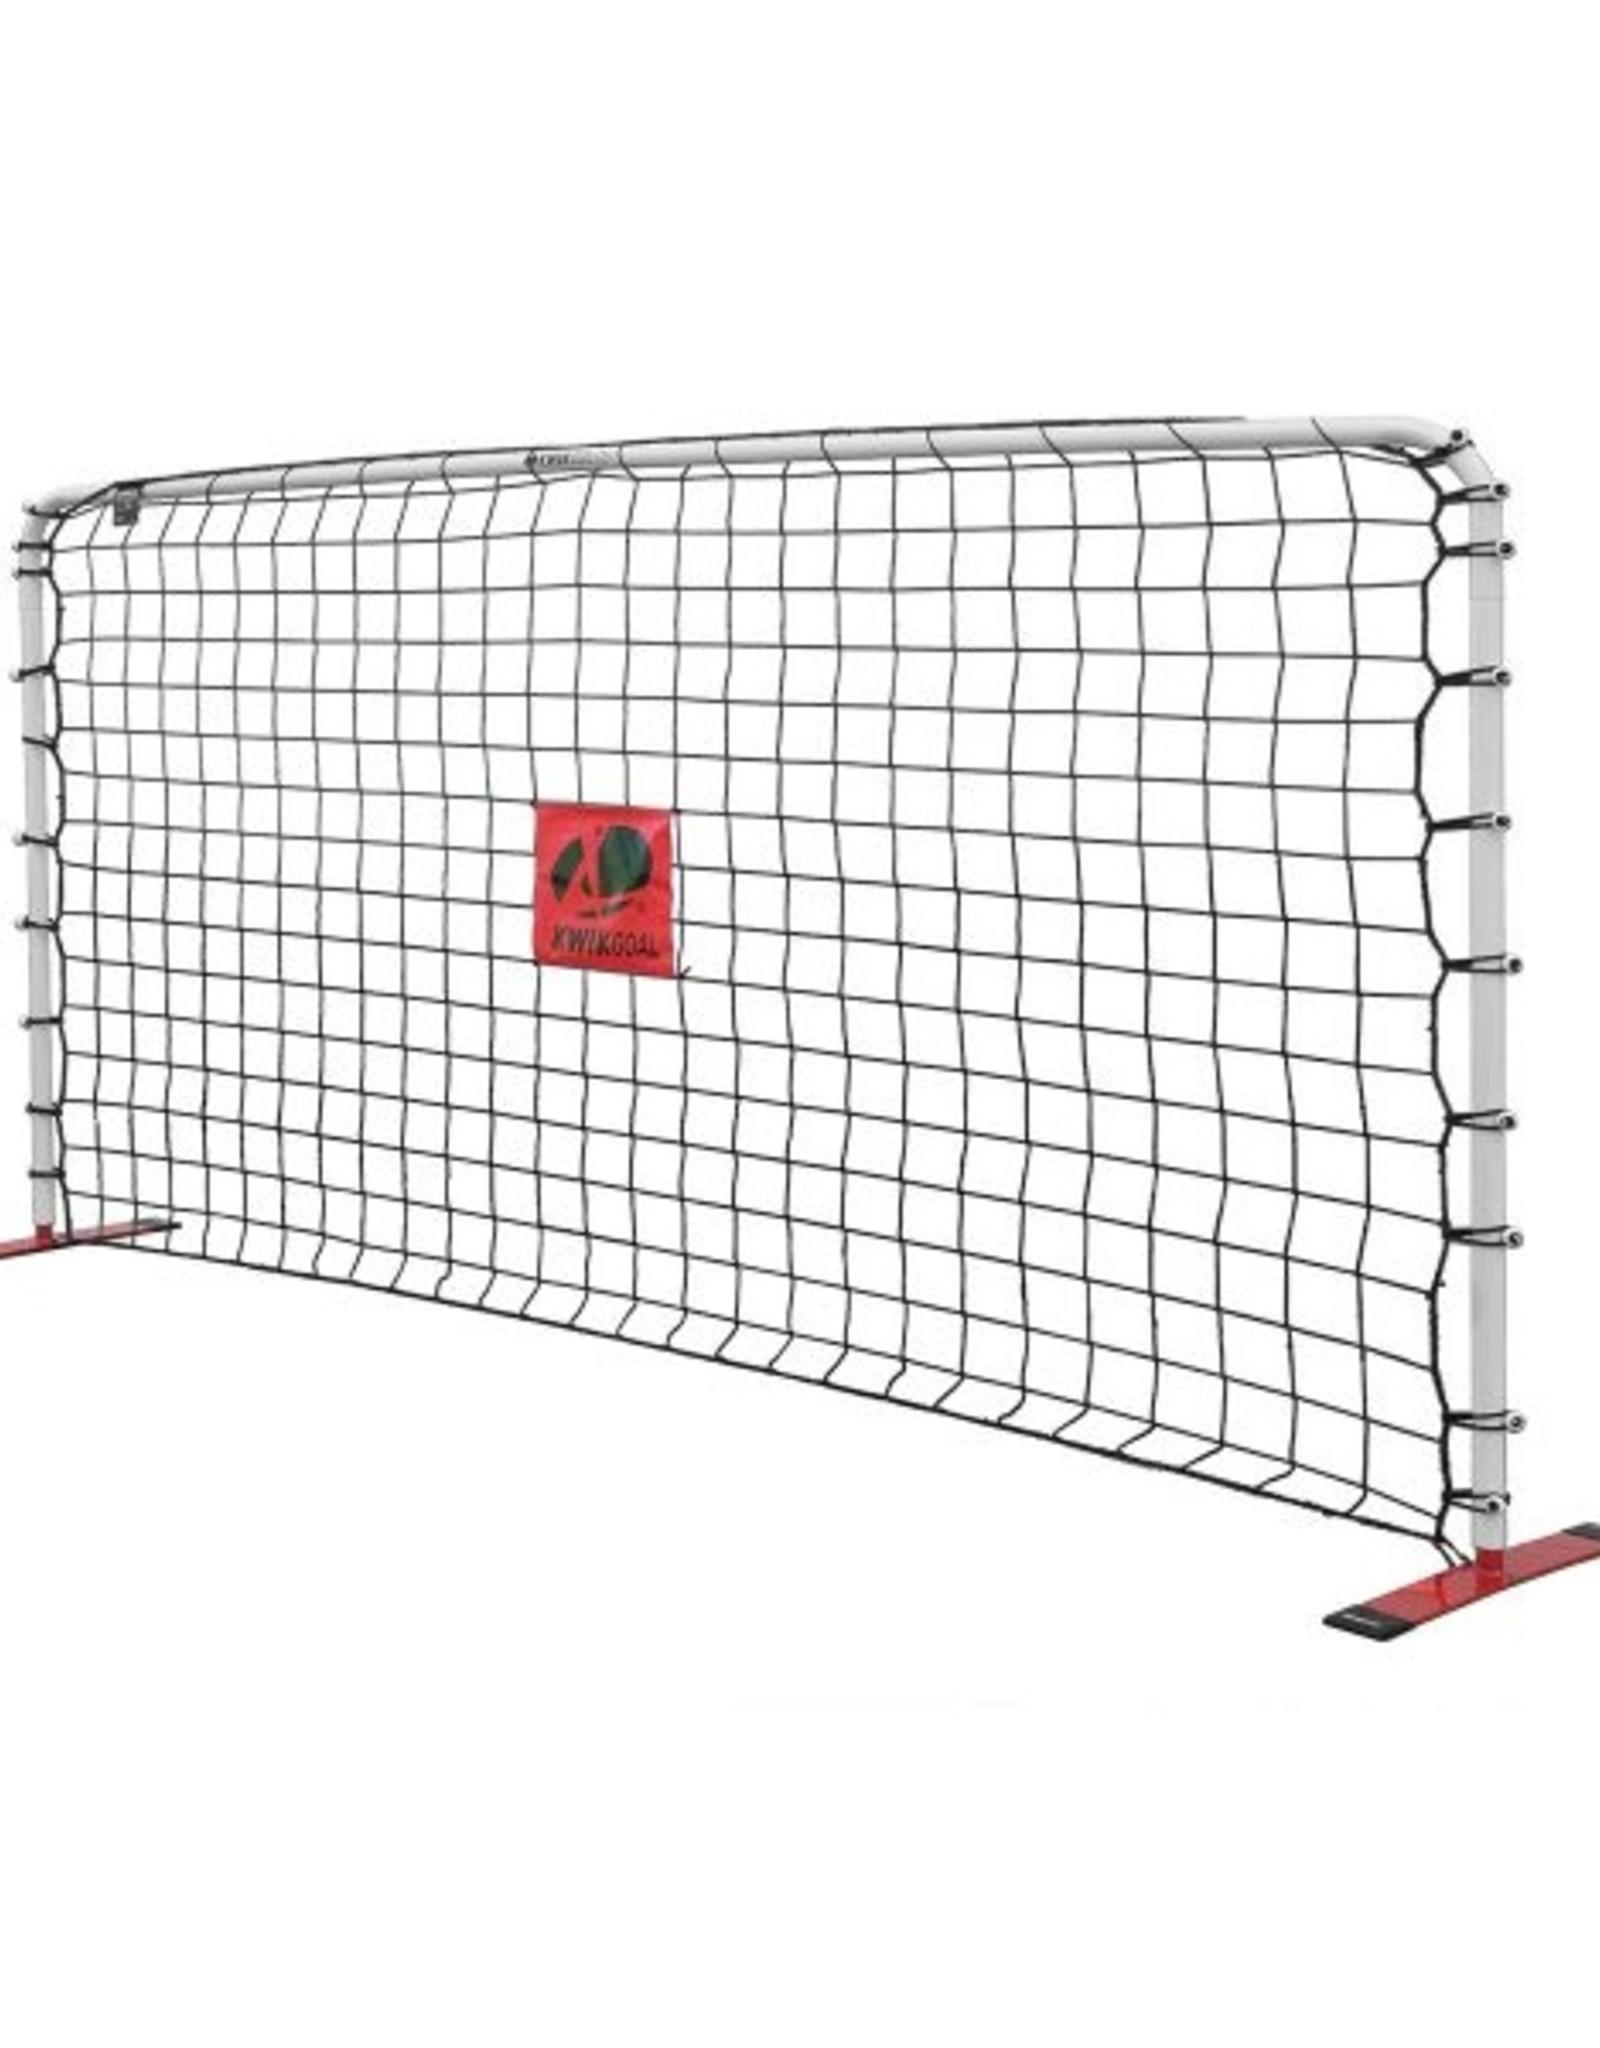 Kwik Goal KWIK Goal ARF-2 Rebounder 5'x10'